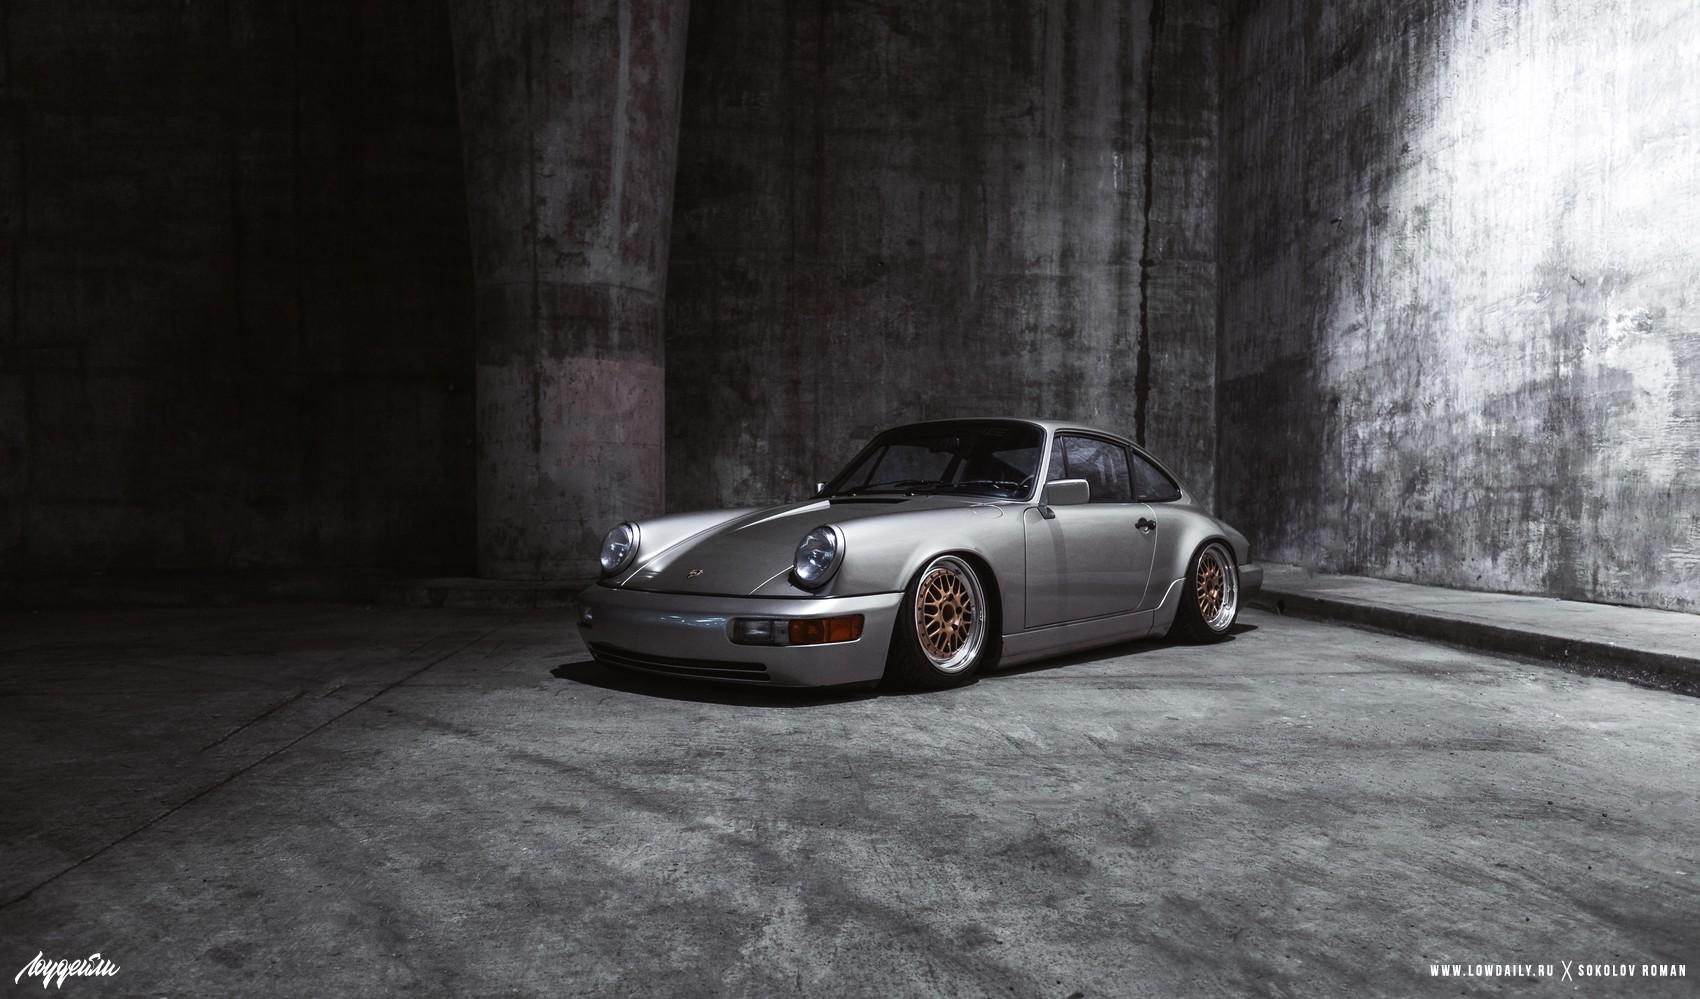 1989 Porsche Carrera 4 (964) DSCF3265